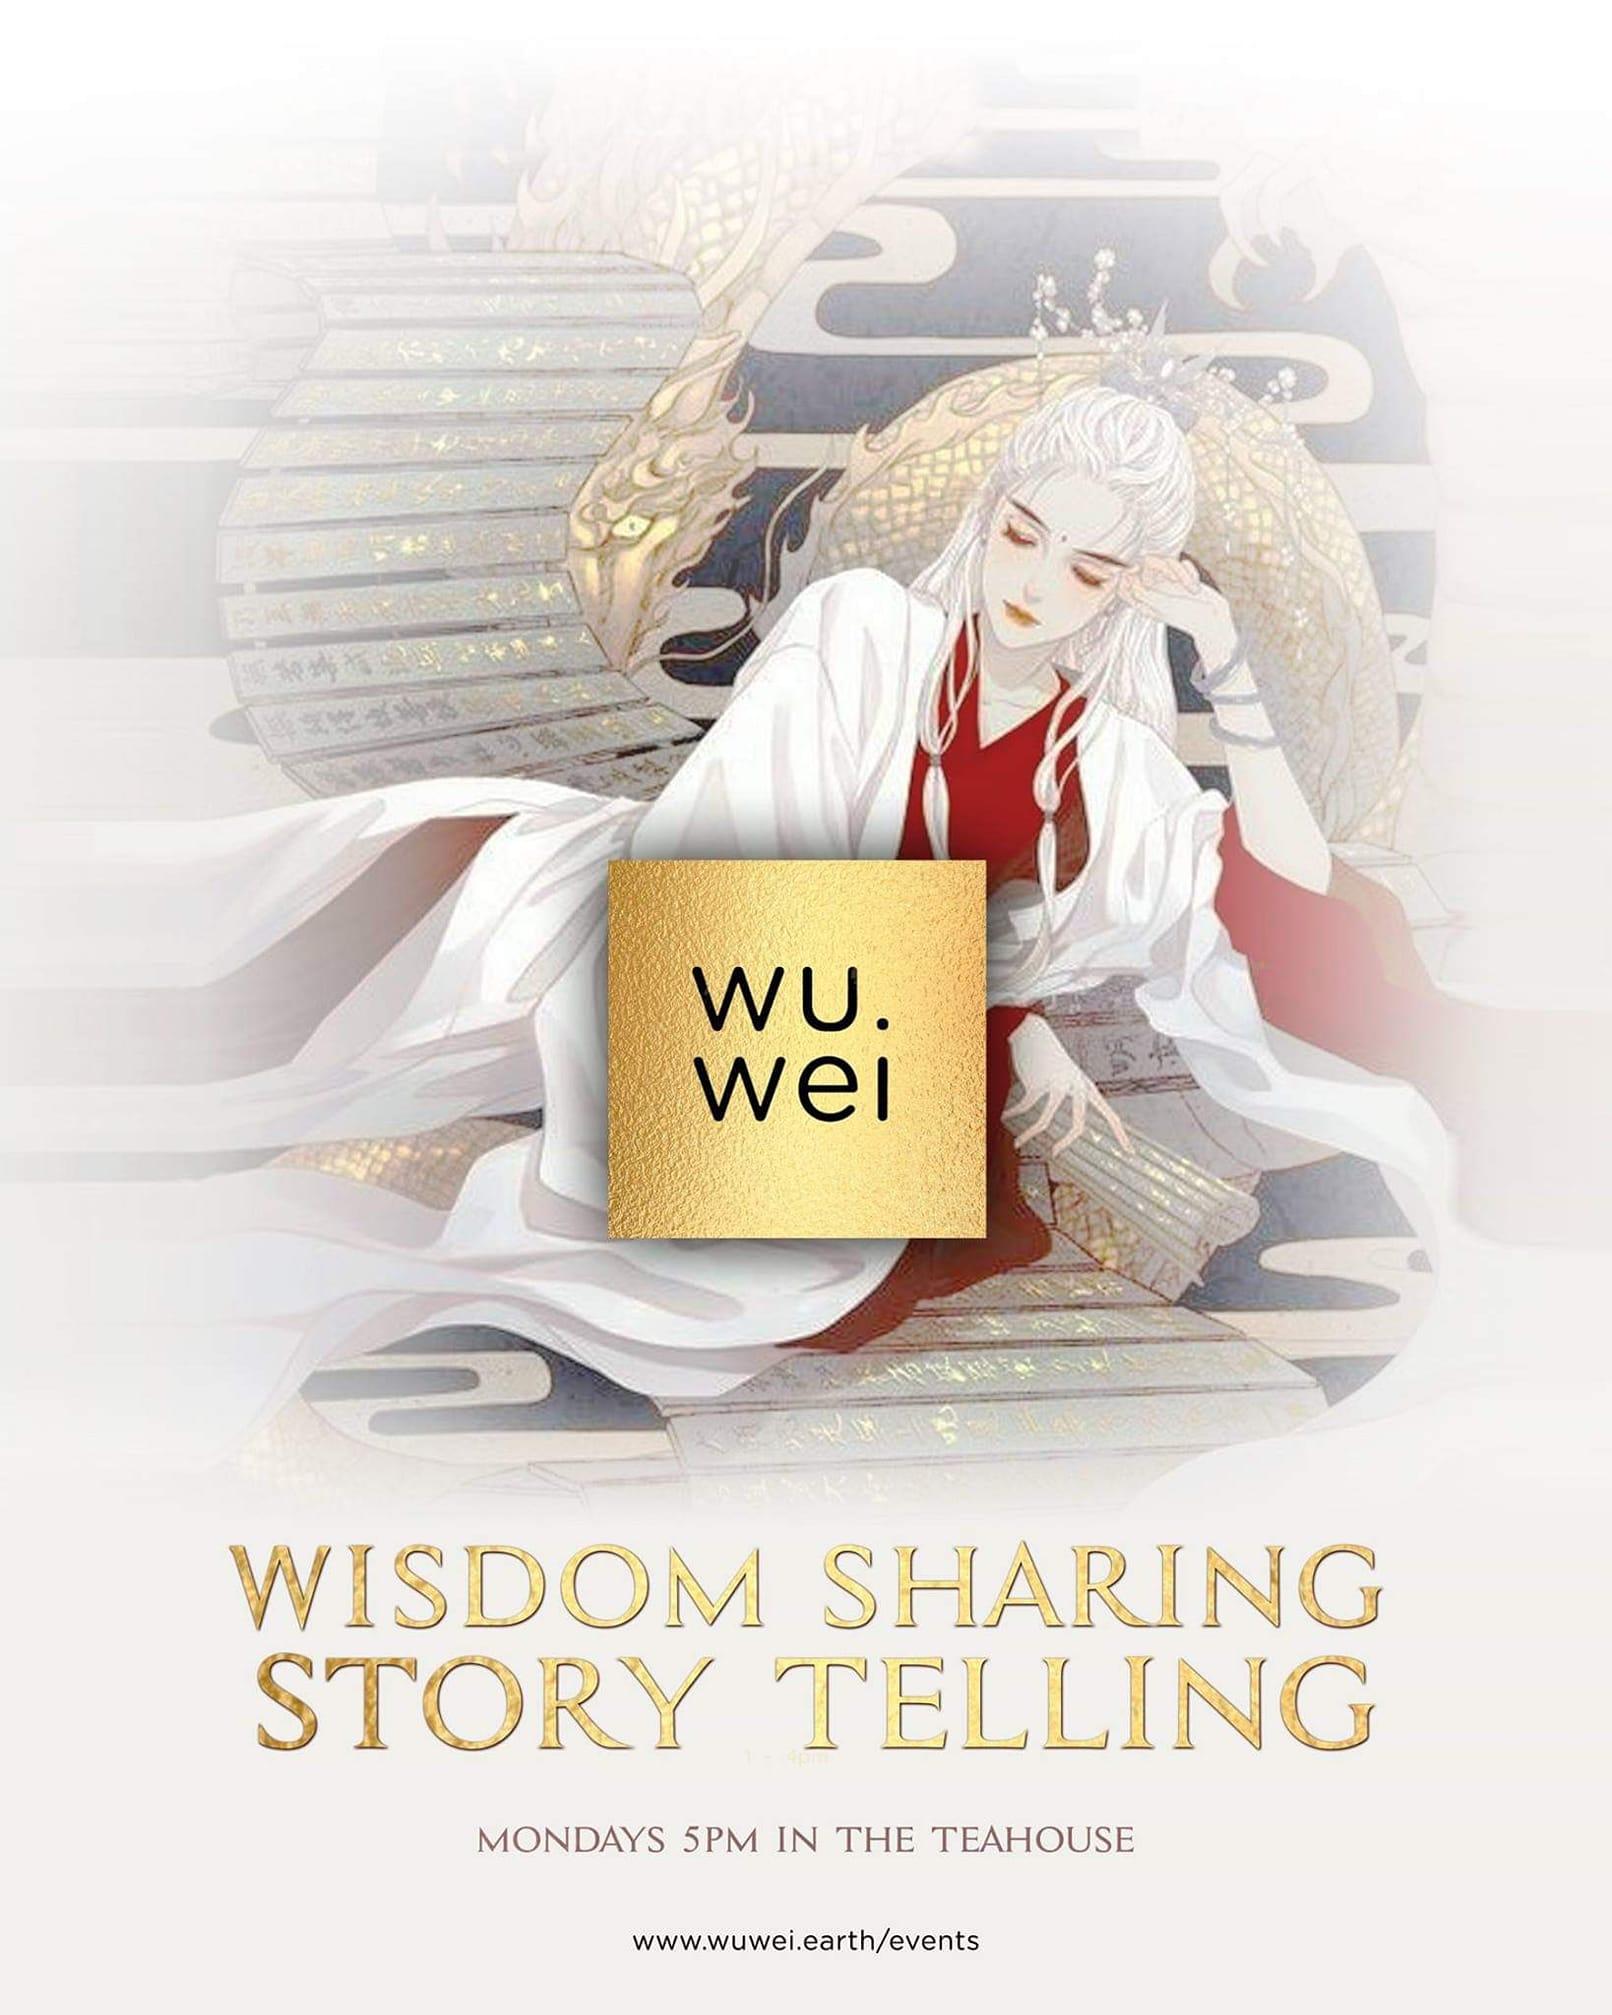 wu_wei_wisdom_sharing_story_telling.jpg